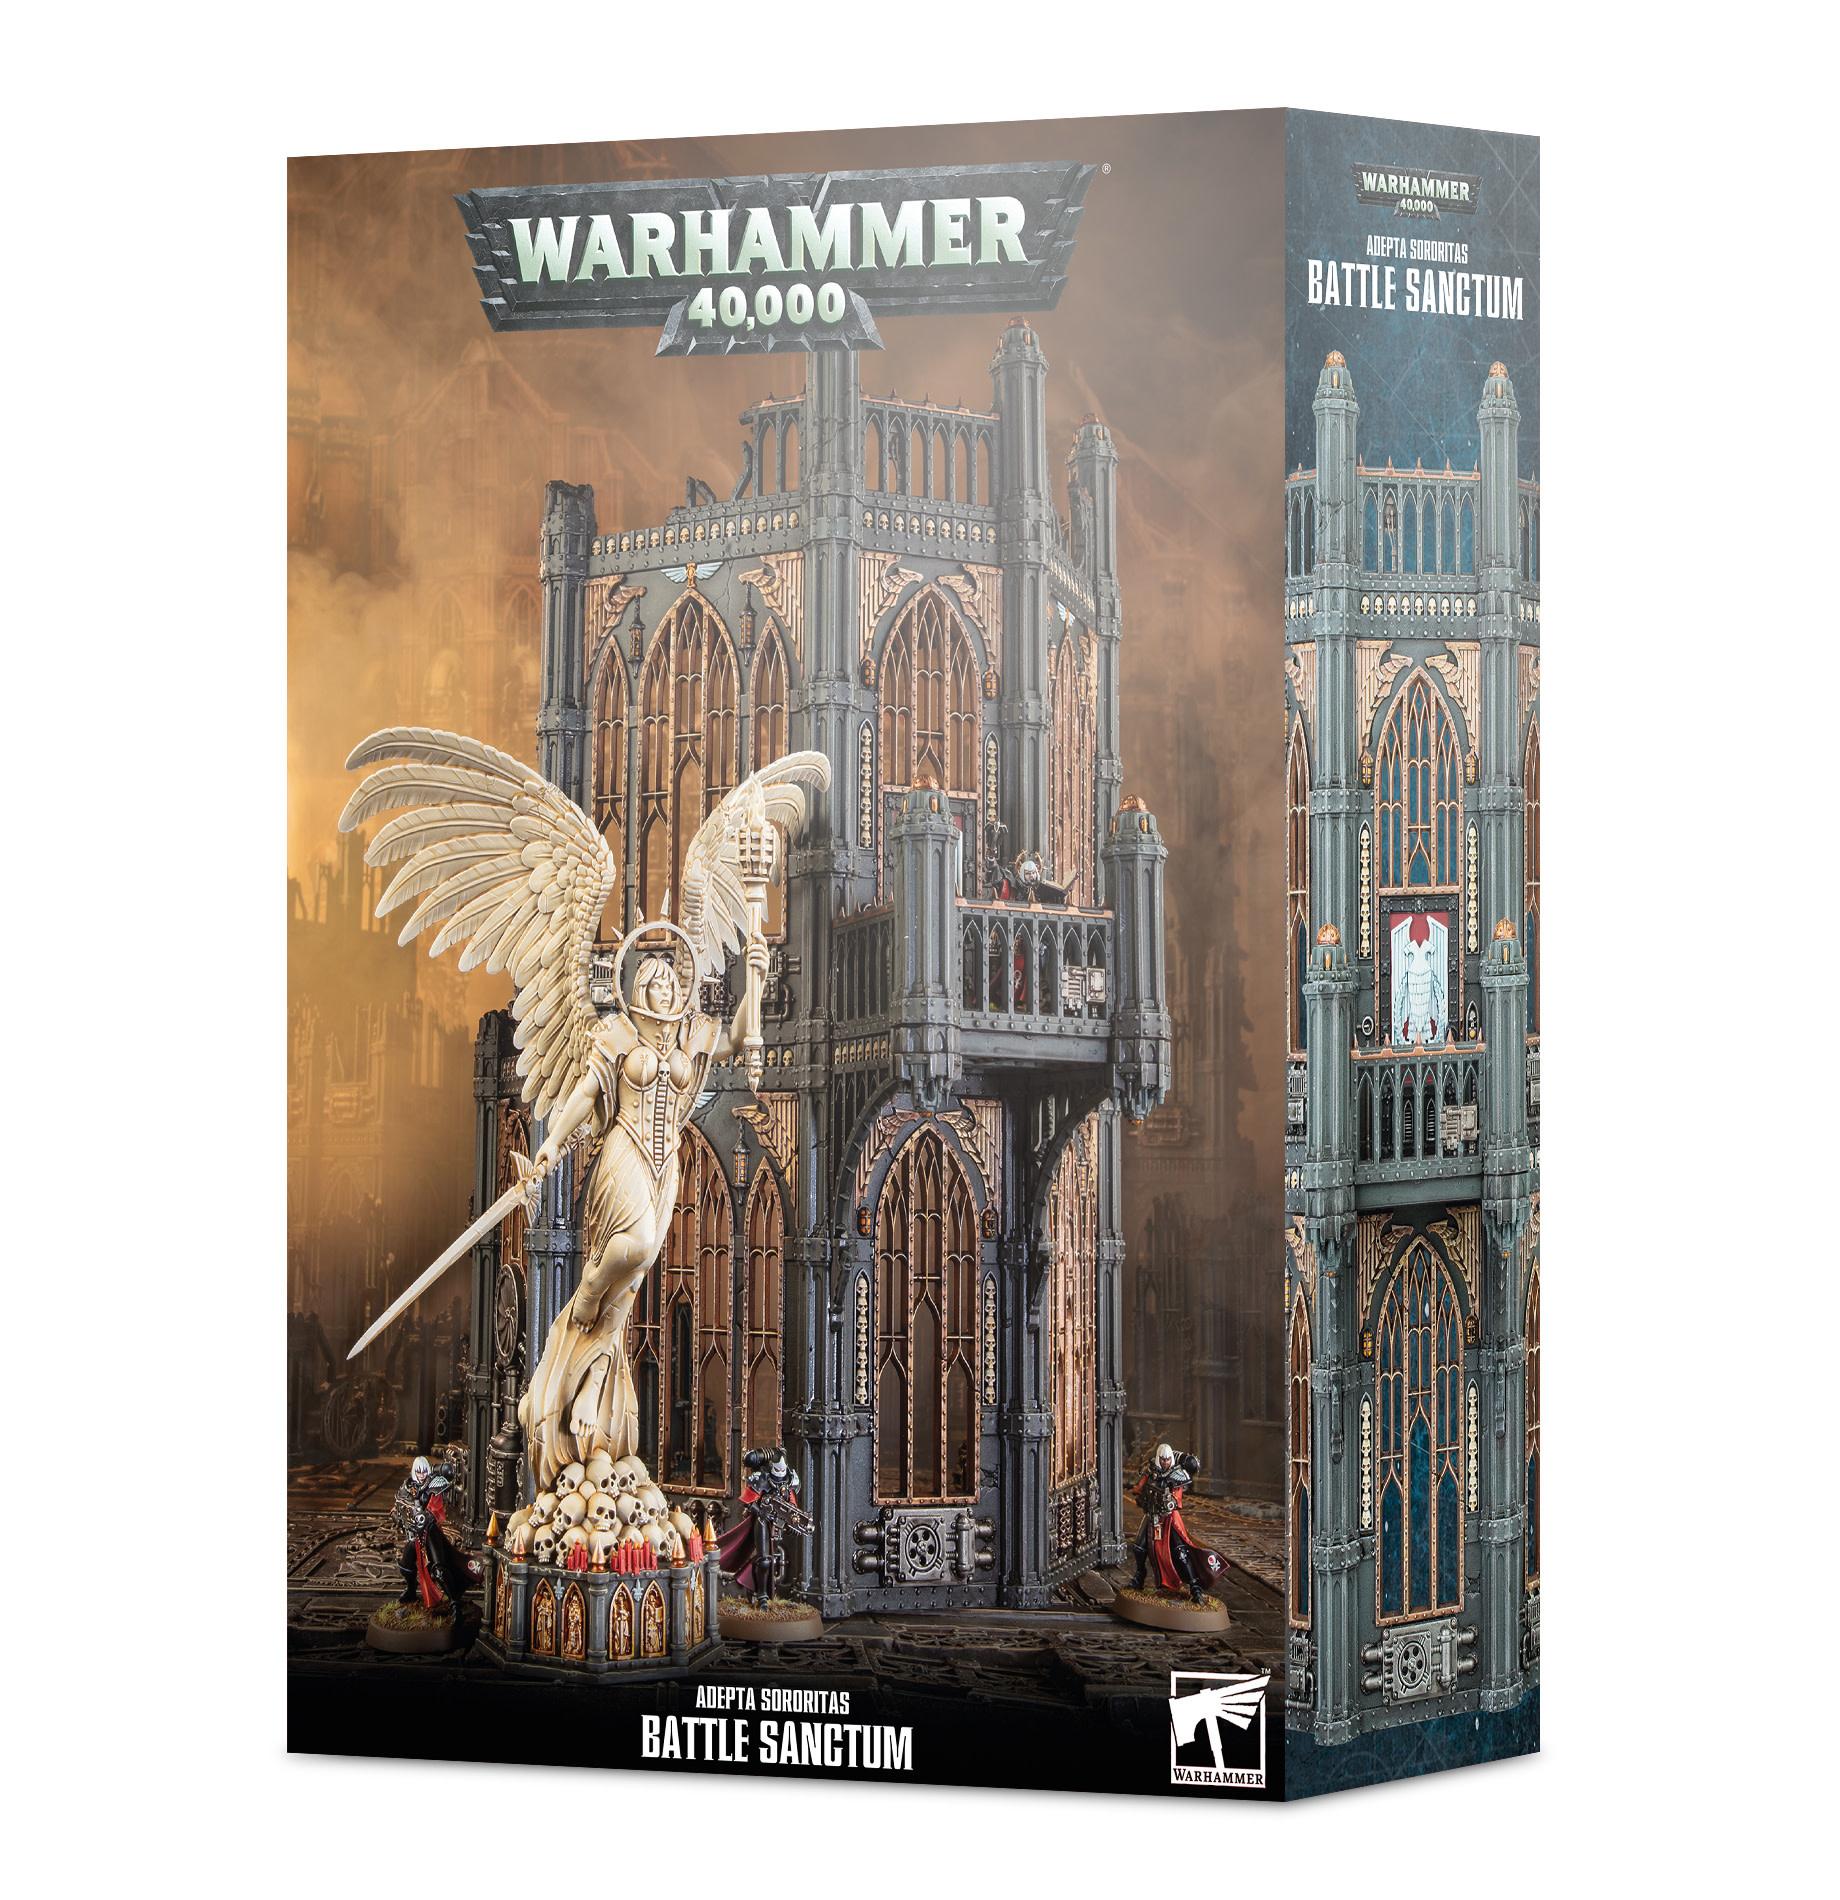 Warhammer 40k Adepta Sororitas Battle Sanctum